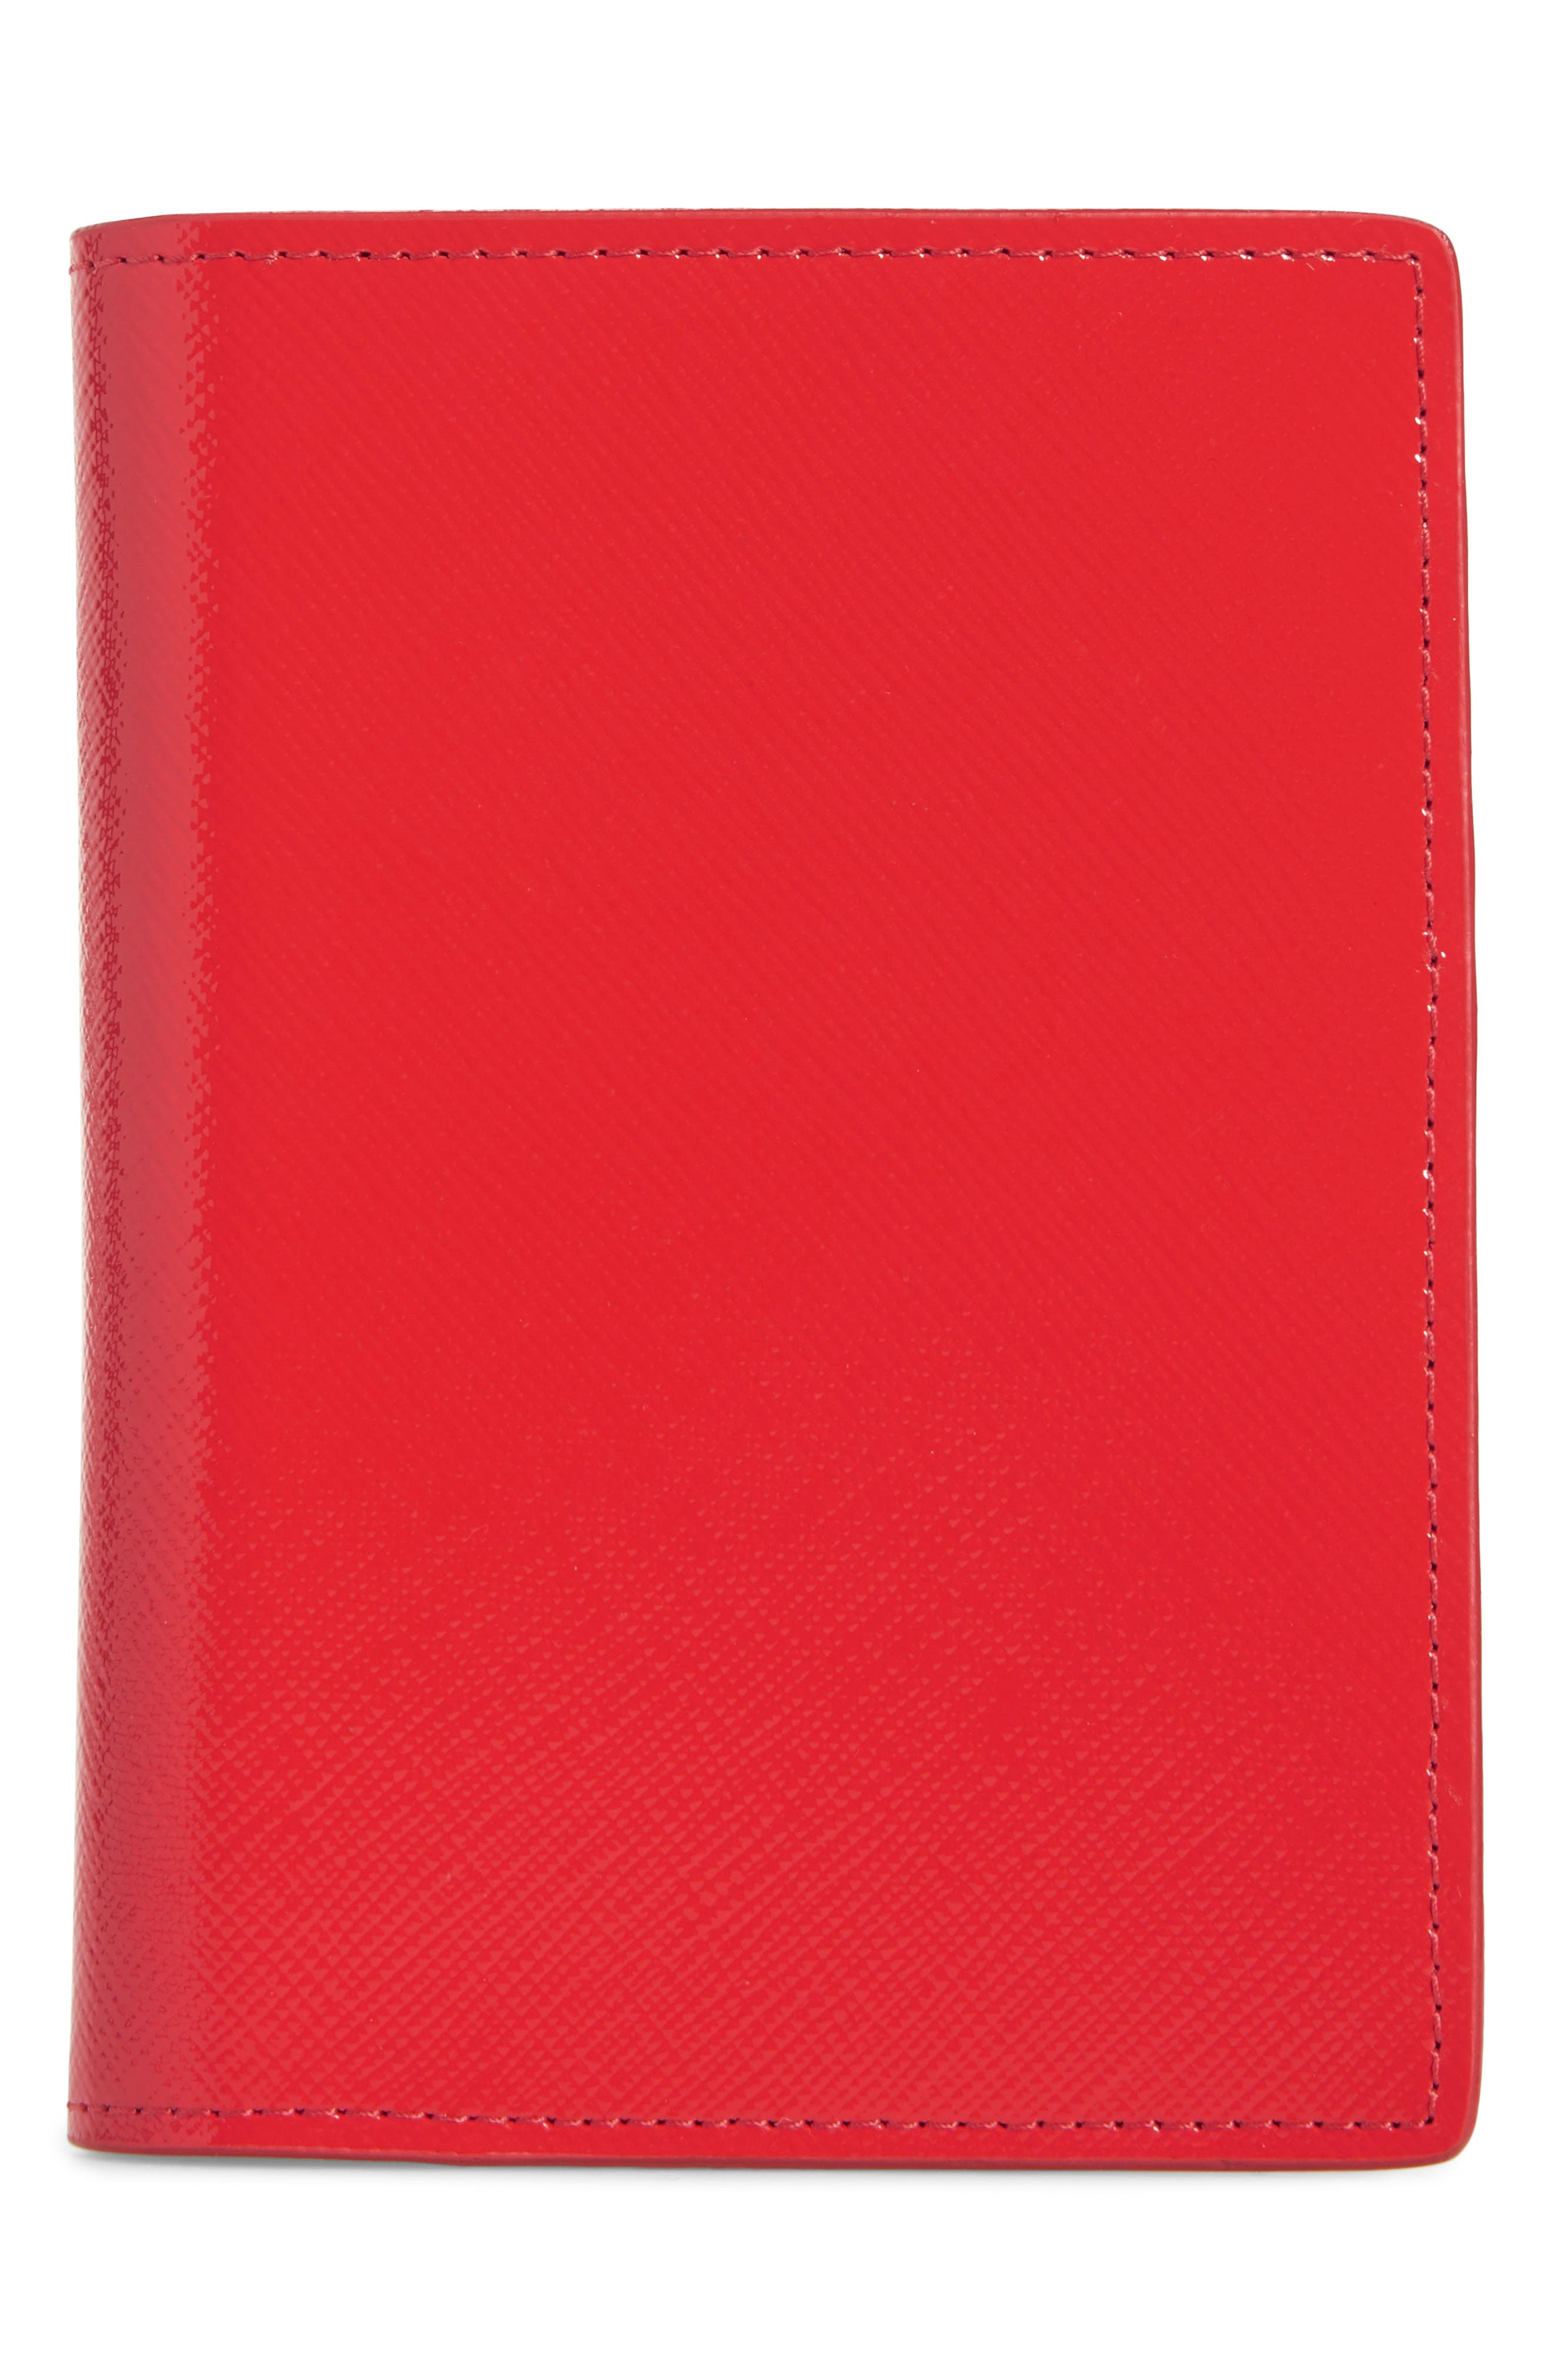 Main Image - Nordstrom Leather Passport Case